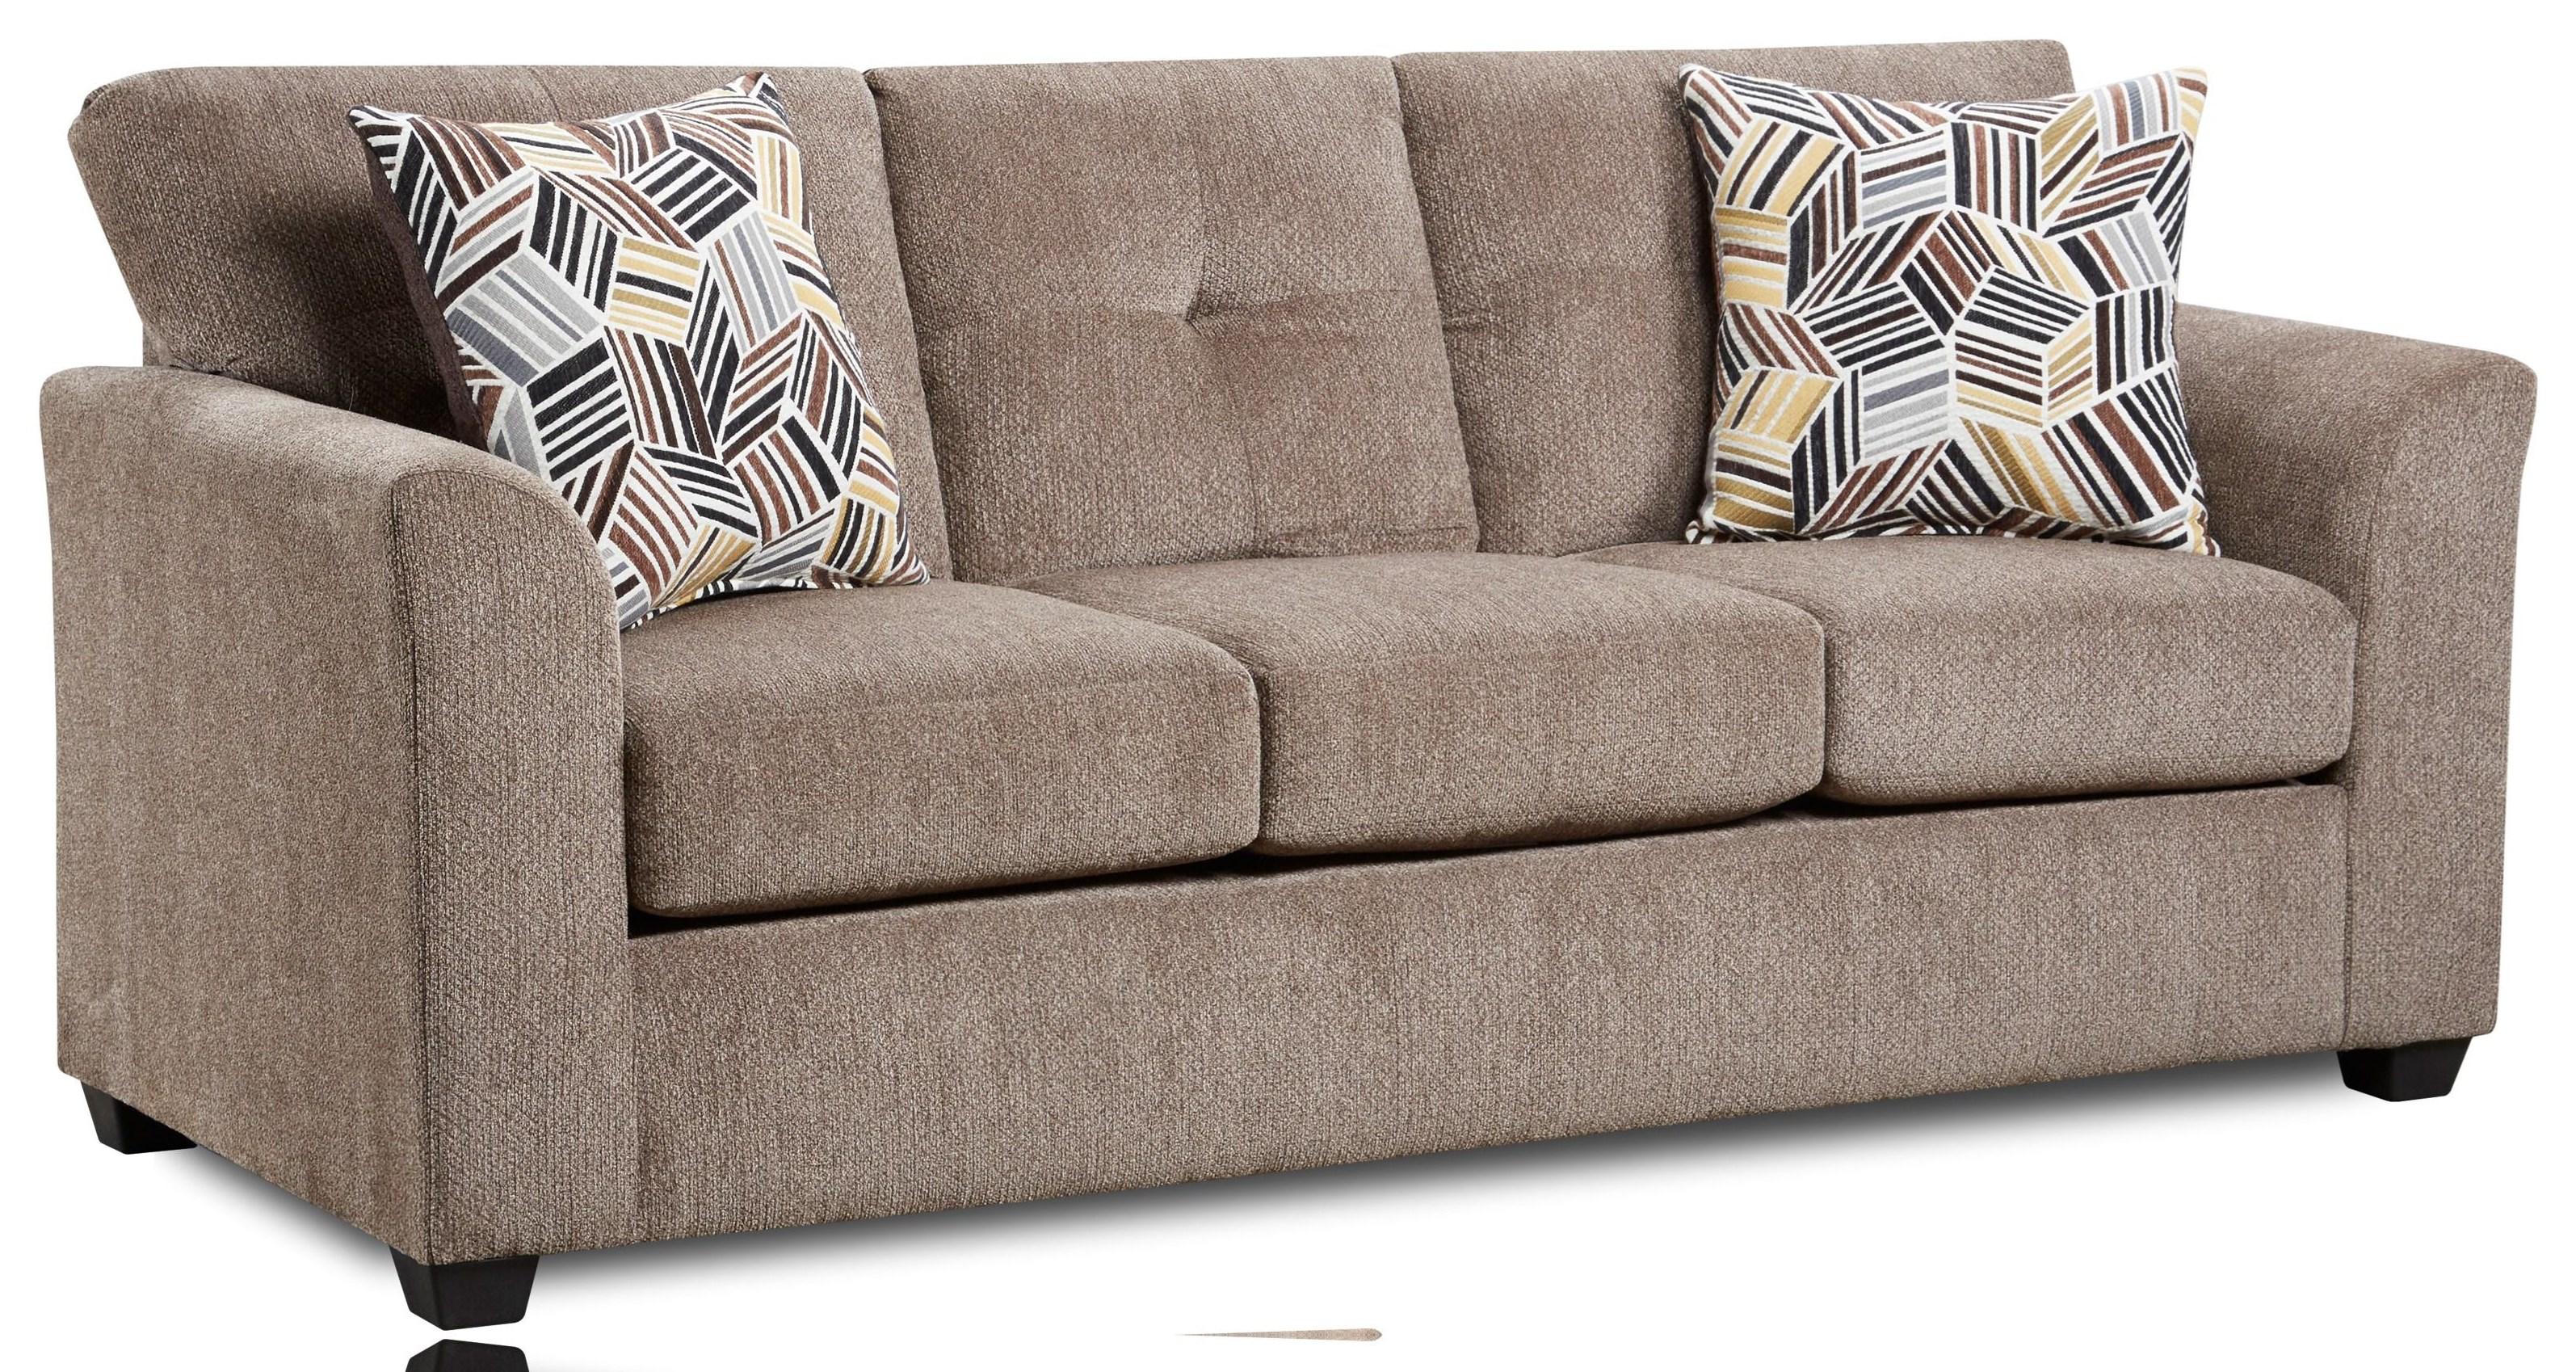 3003 KENNEDY Cocoa Sofa by Washington Brothers Furniture at Furniture Fair - North Carolina